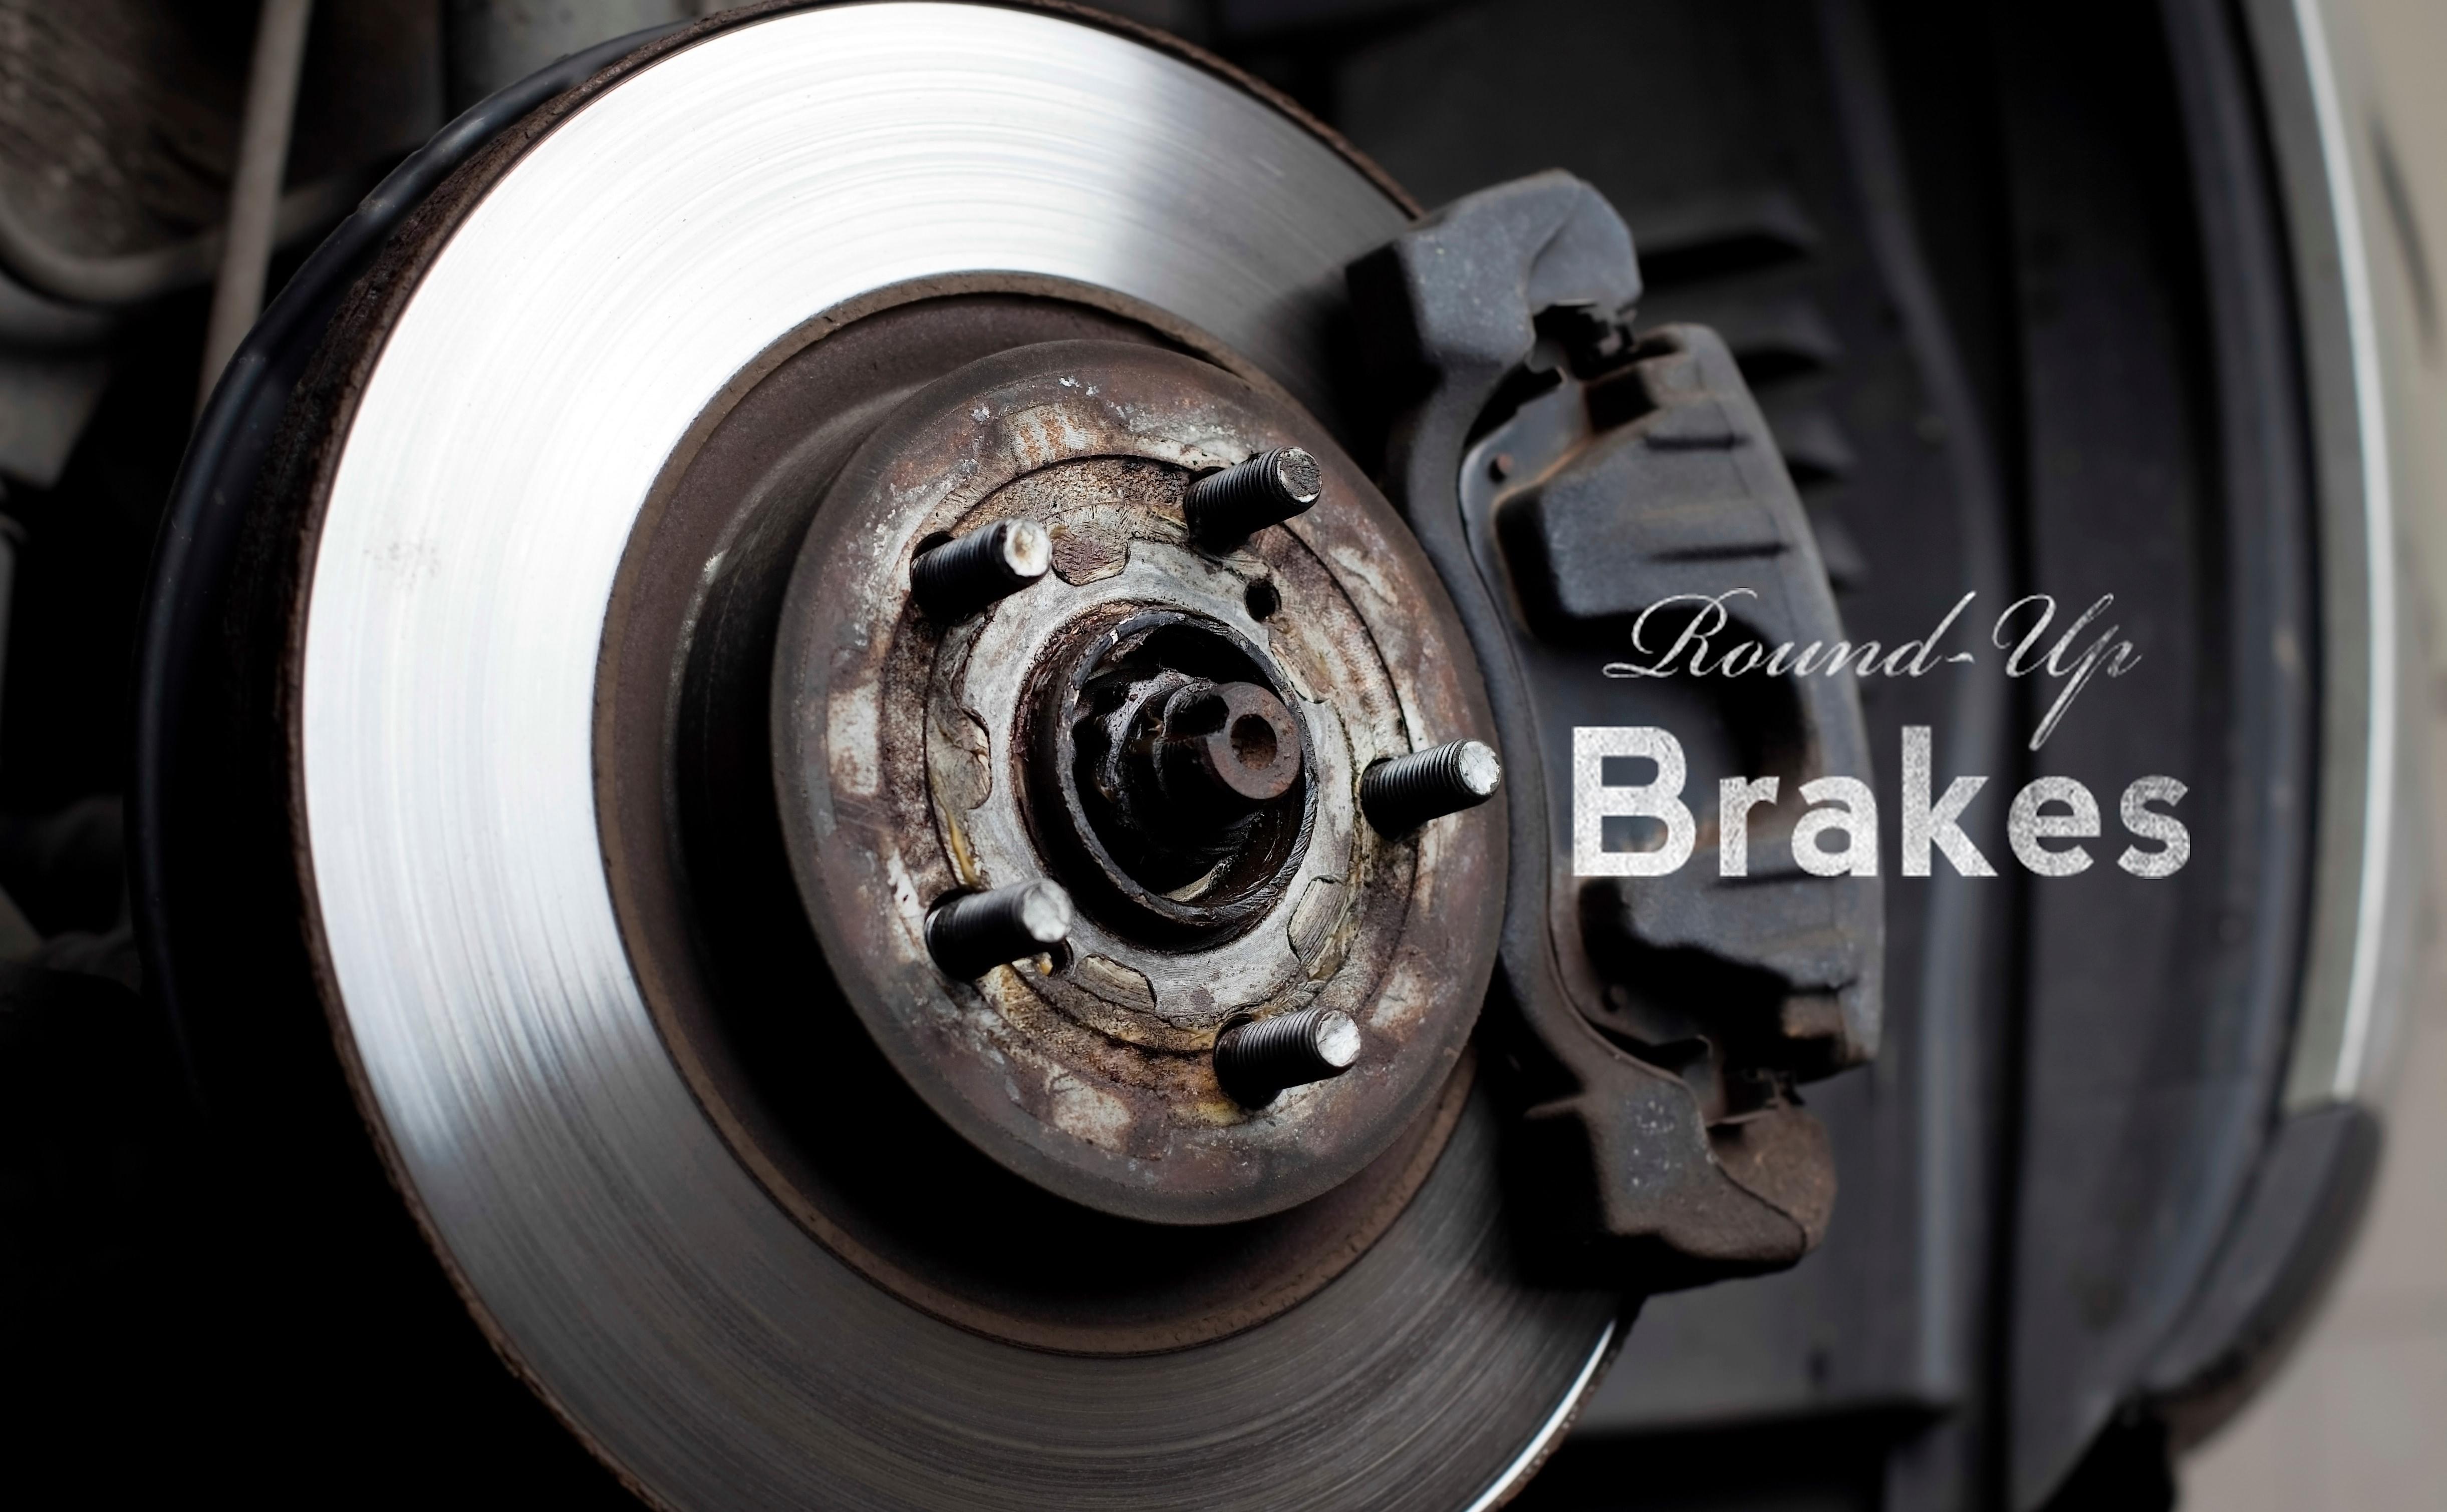 Brakes: Round-Up